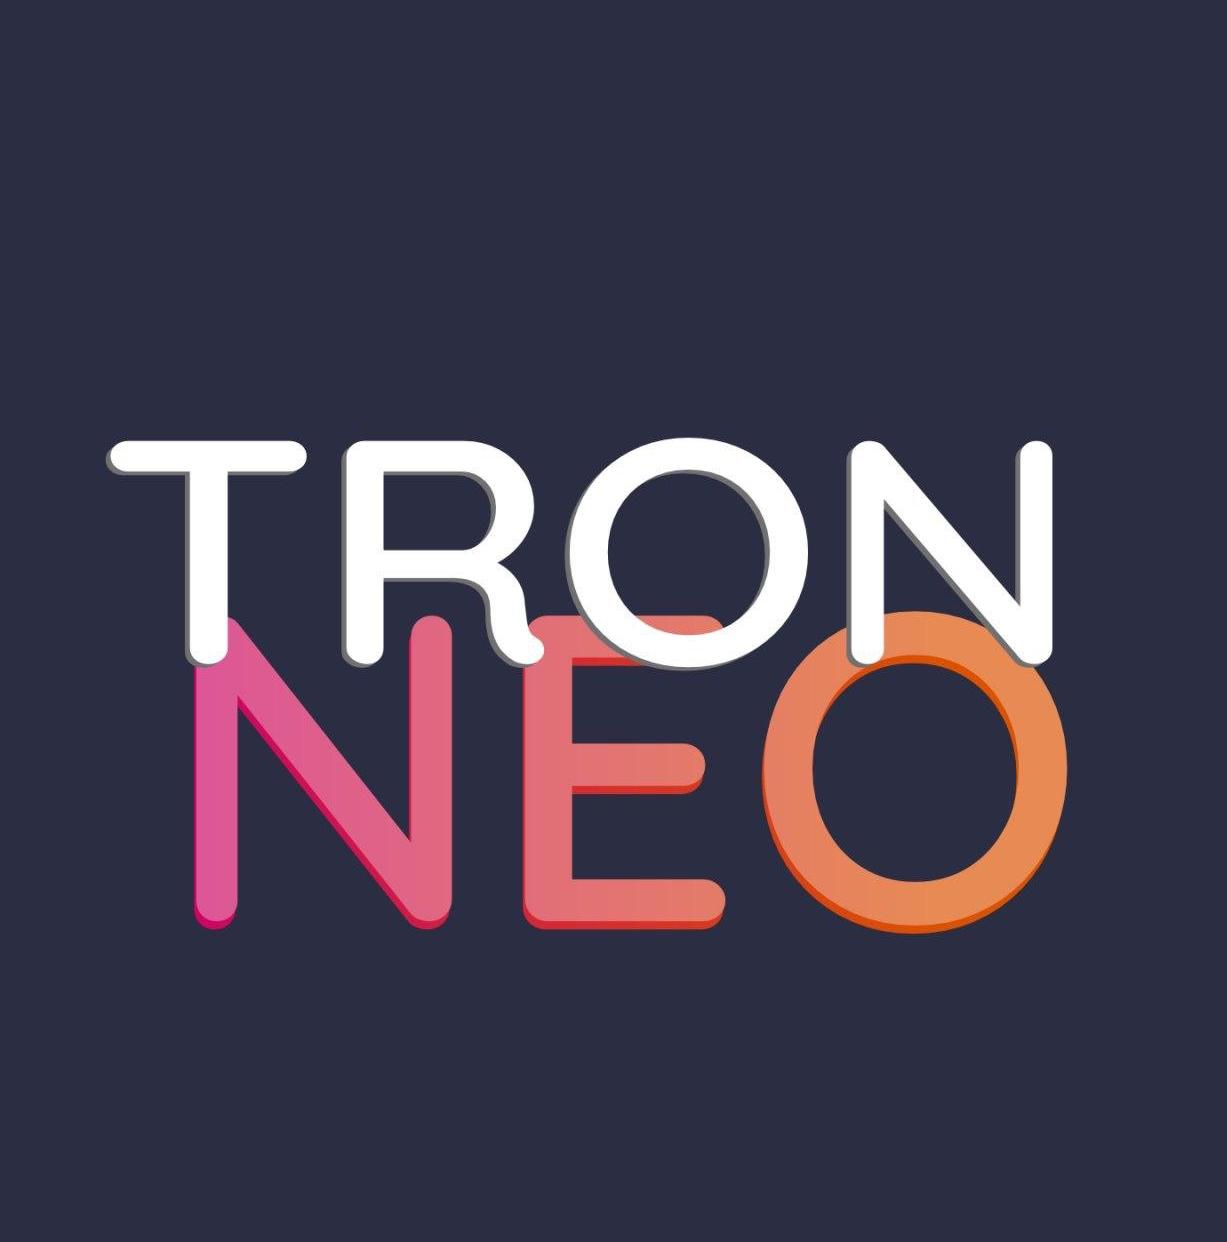 TronNeo logo